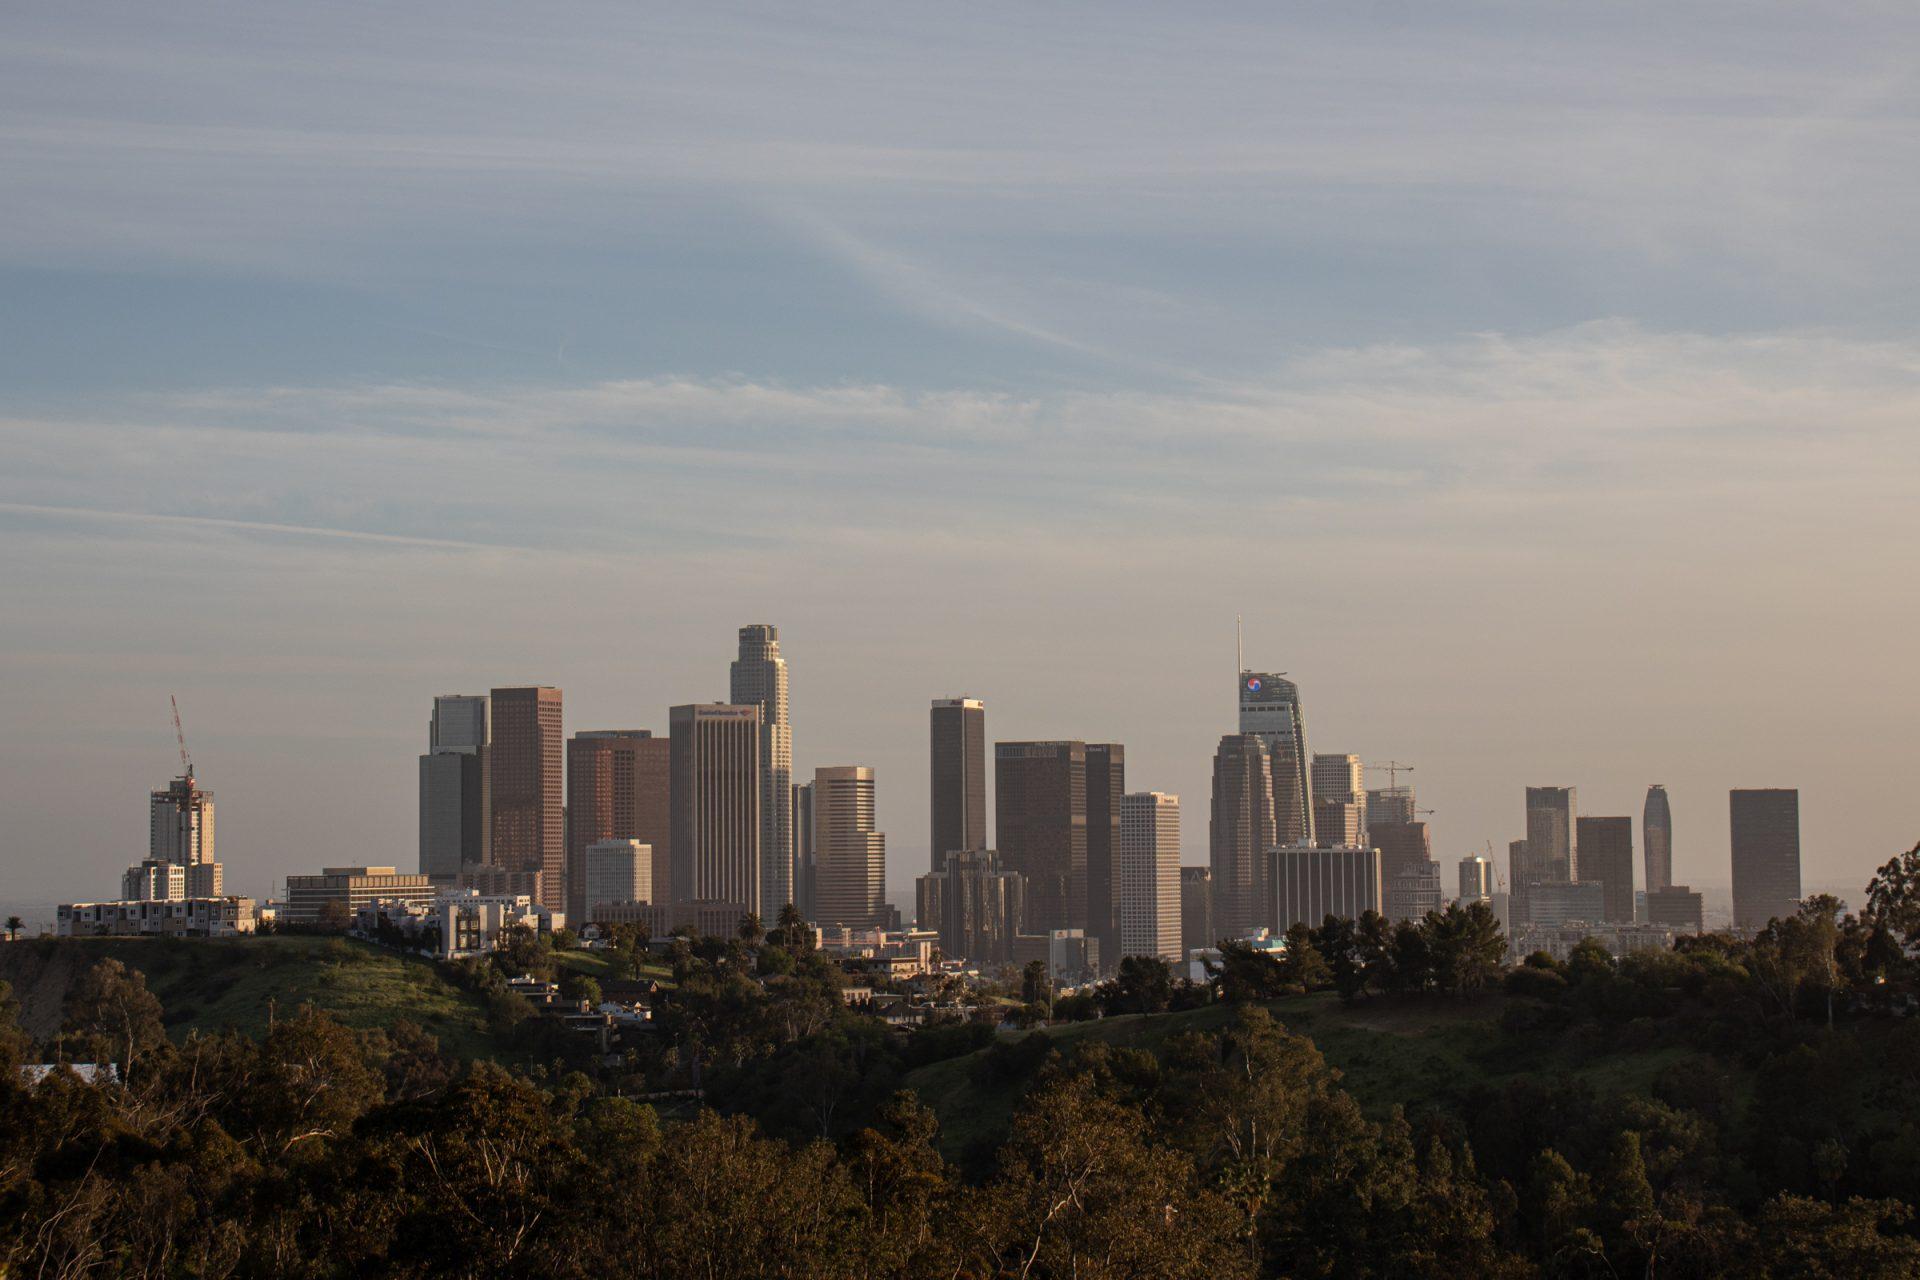 City Skyline Beyond Trees